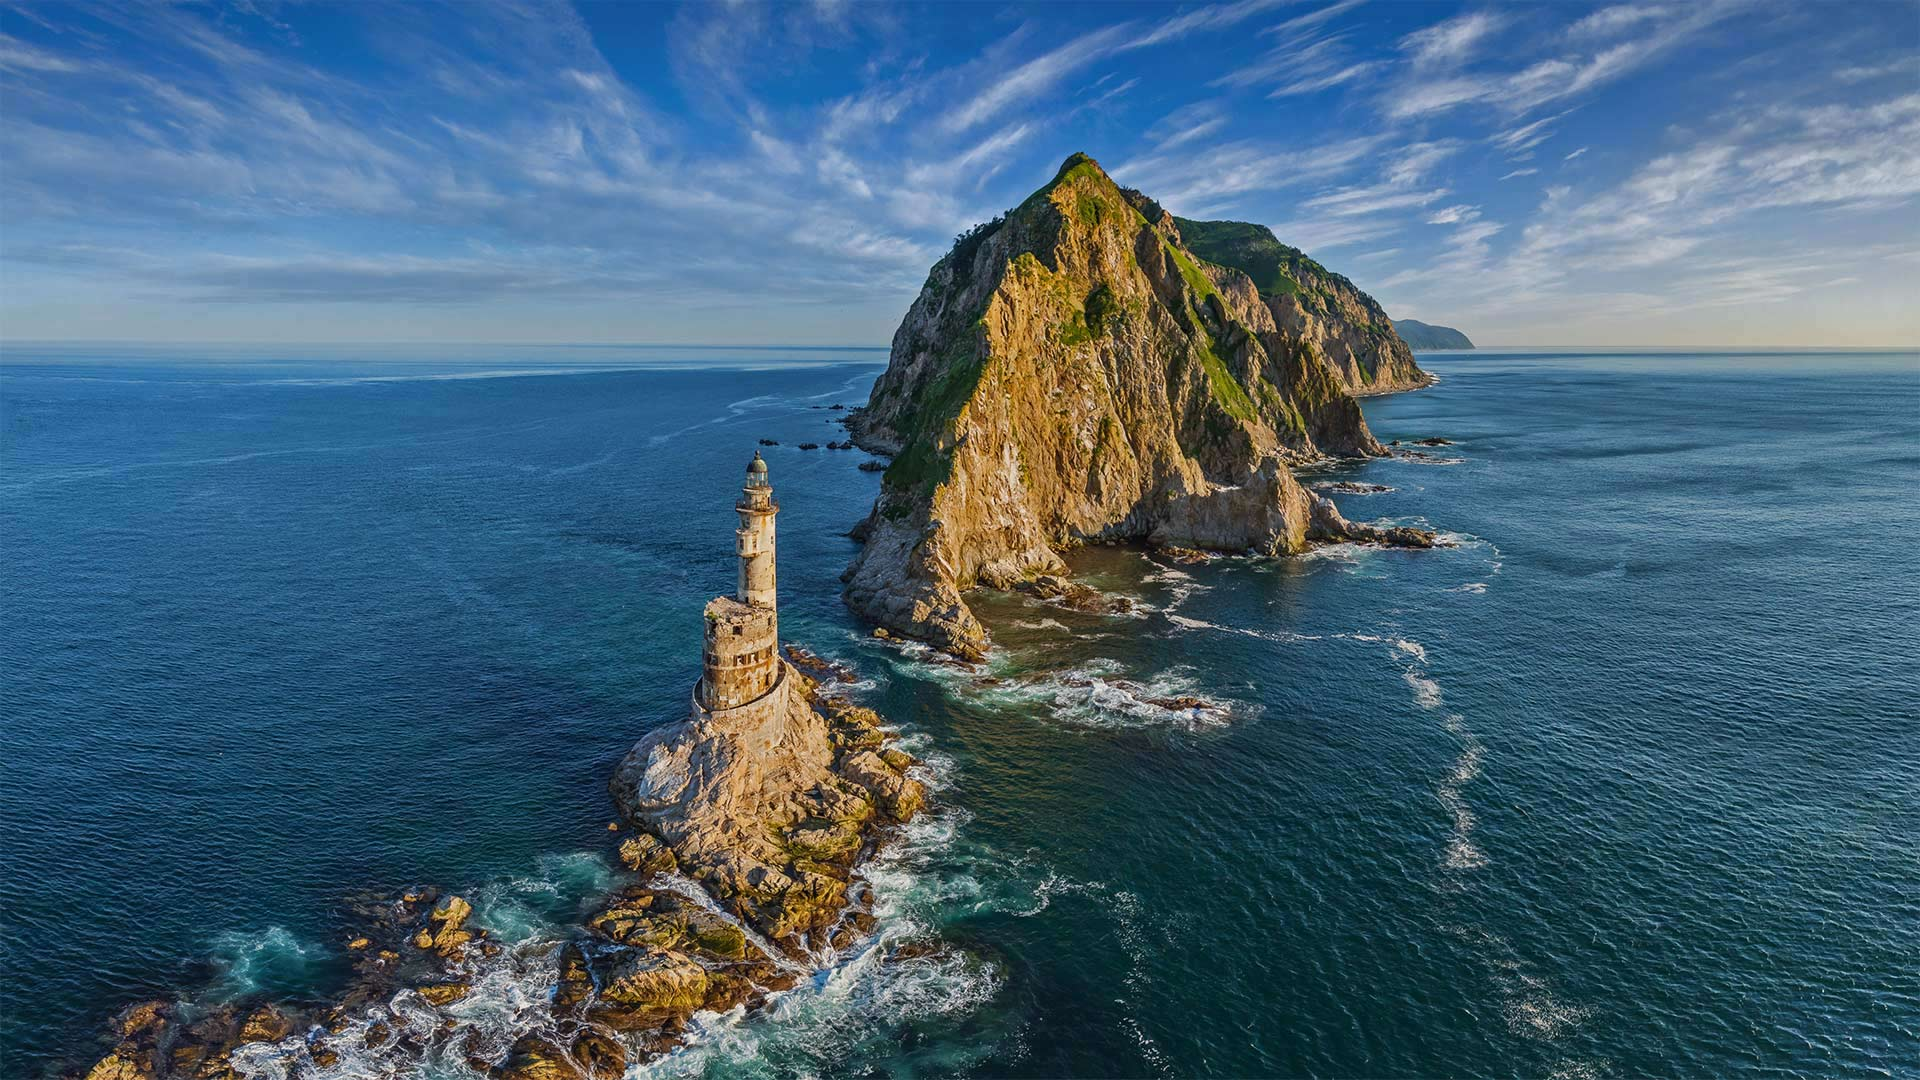 阿尼瓦角的灯塔,俄罗斯萨哈林岛 (© Amazing Aerial Agency/Offset by Shutterstock)